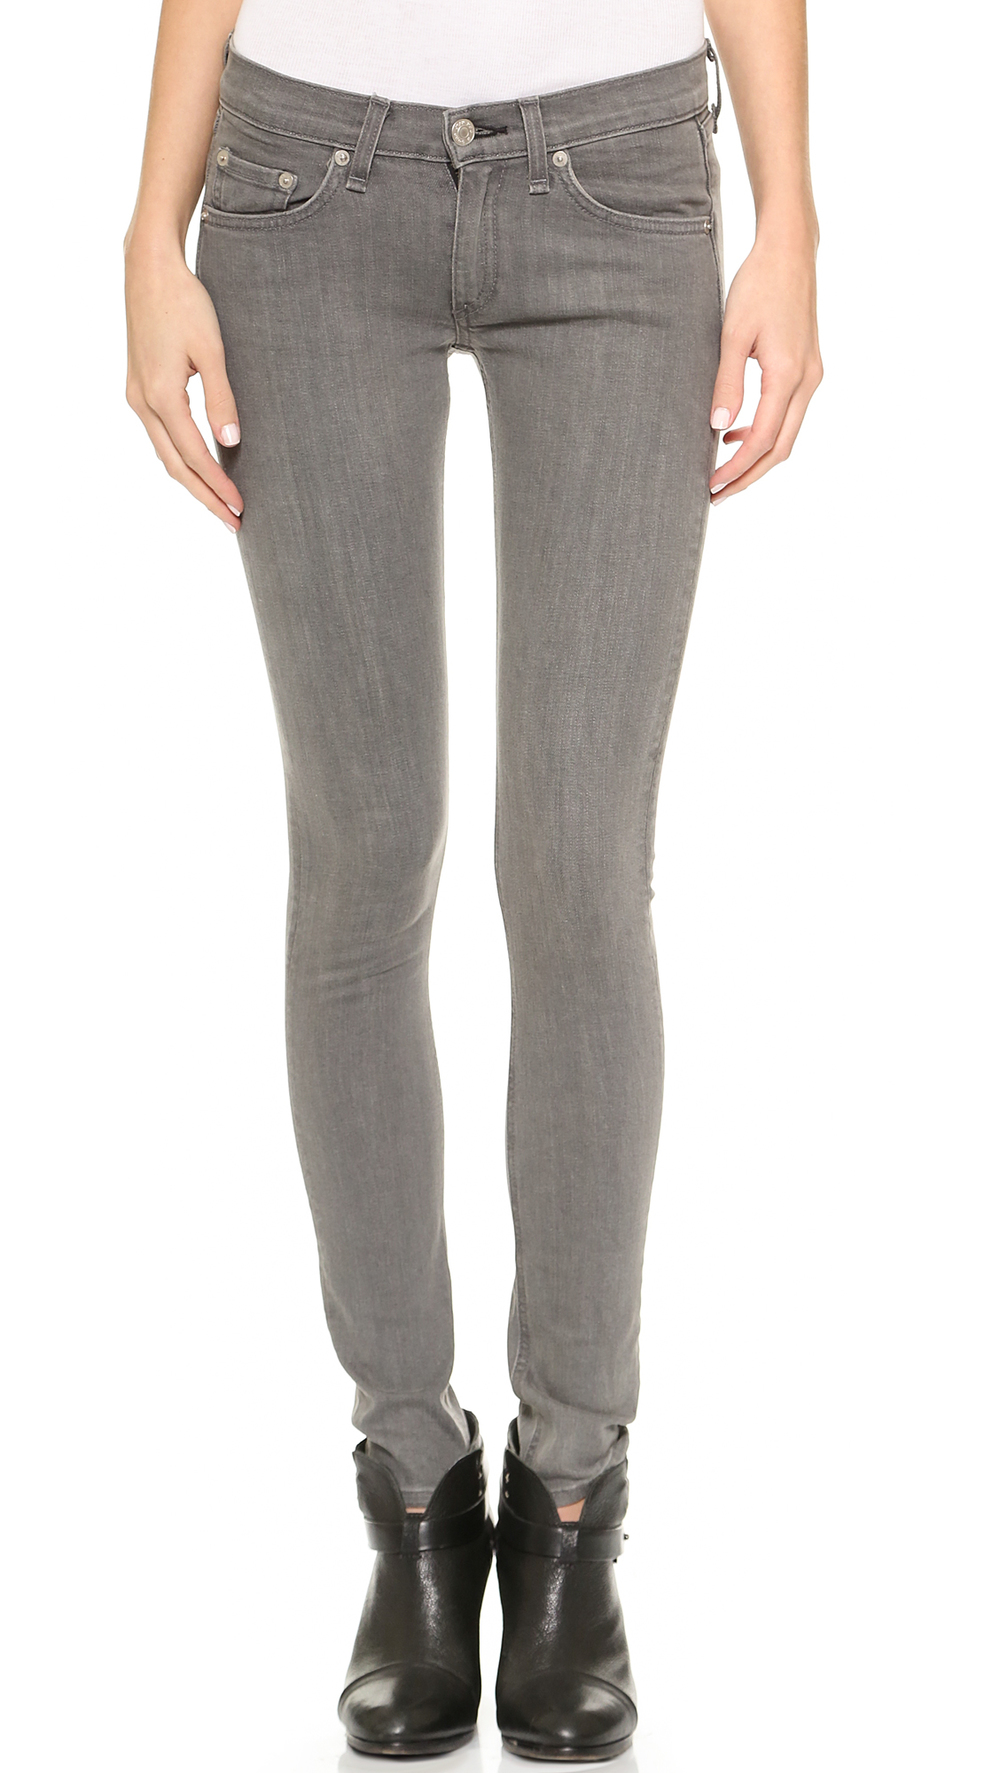 gray jeans.jpg